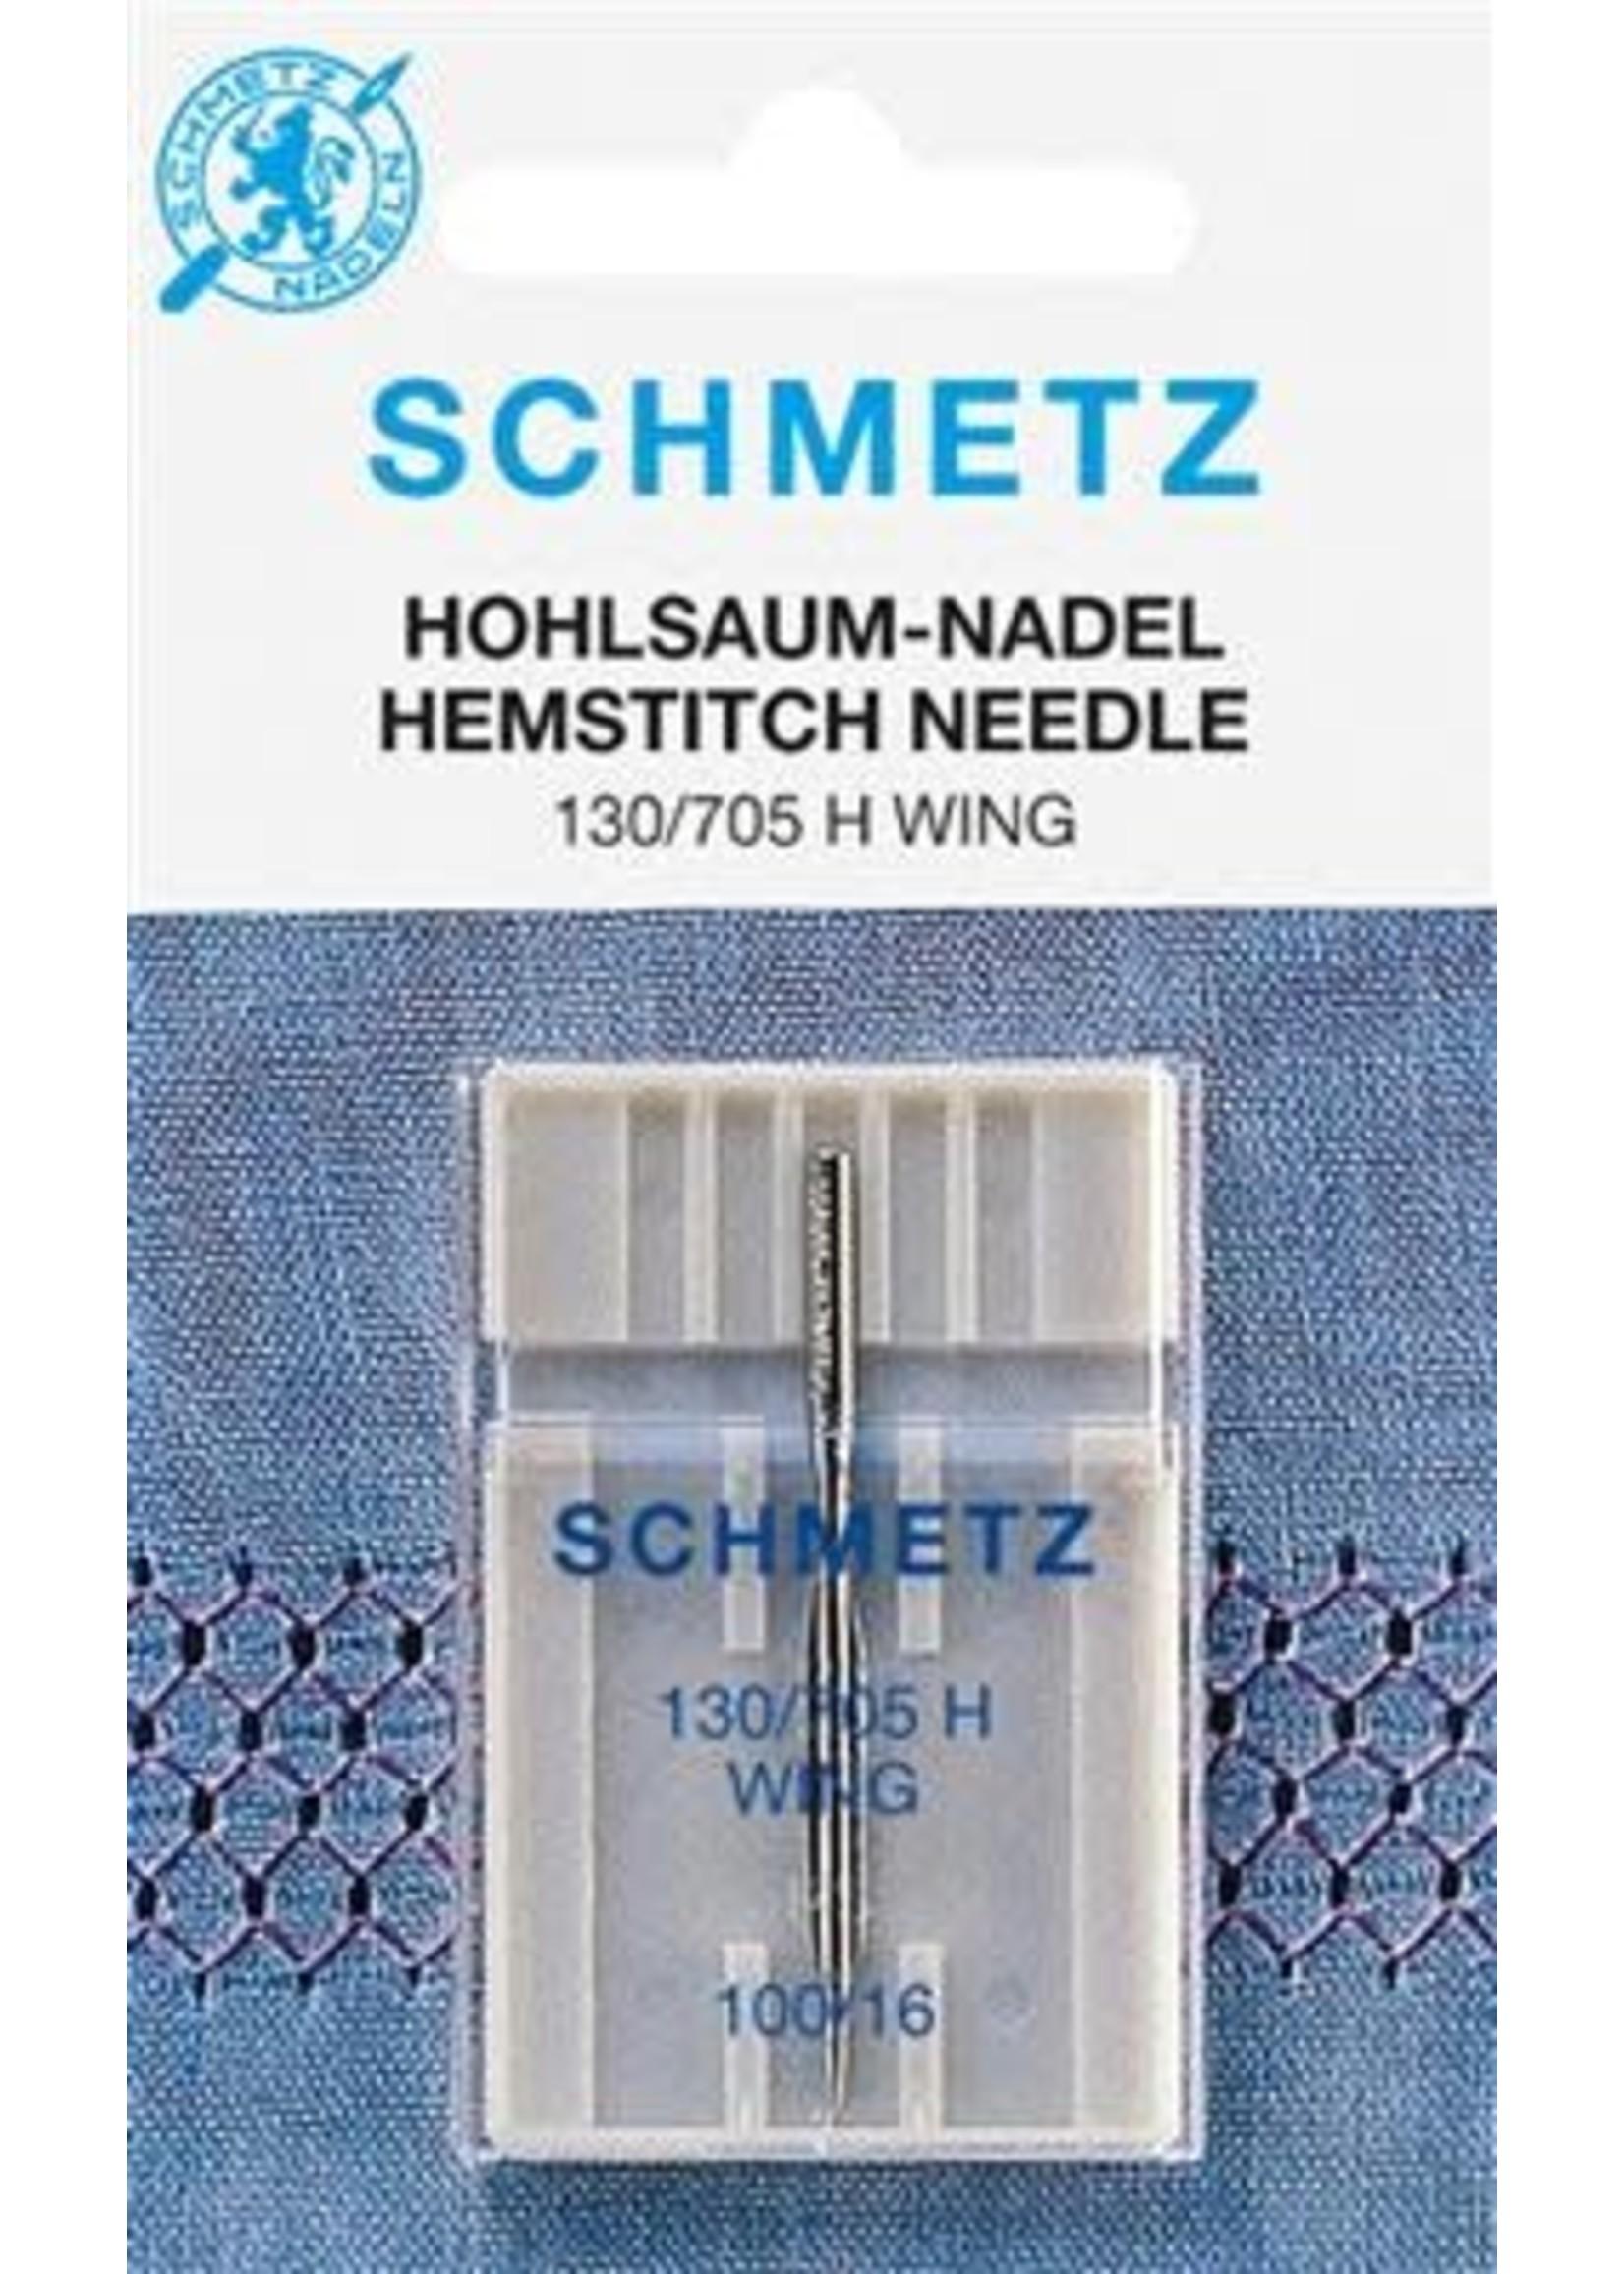 Schmetz Wing needle